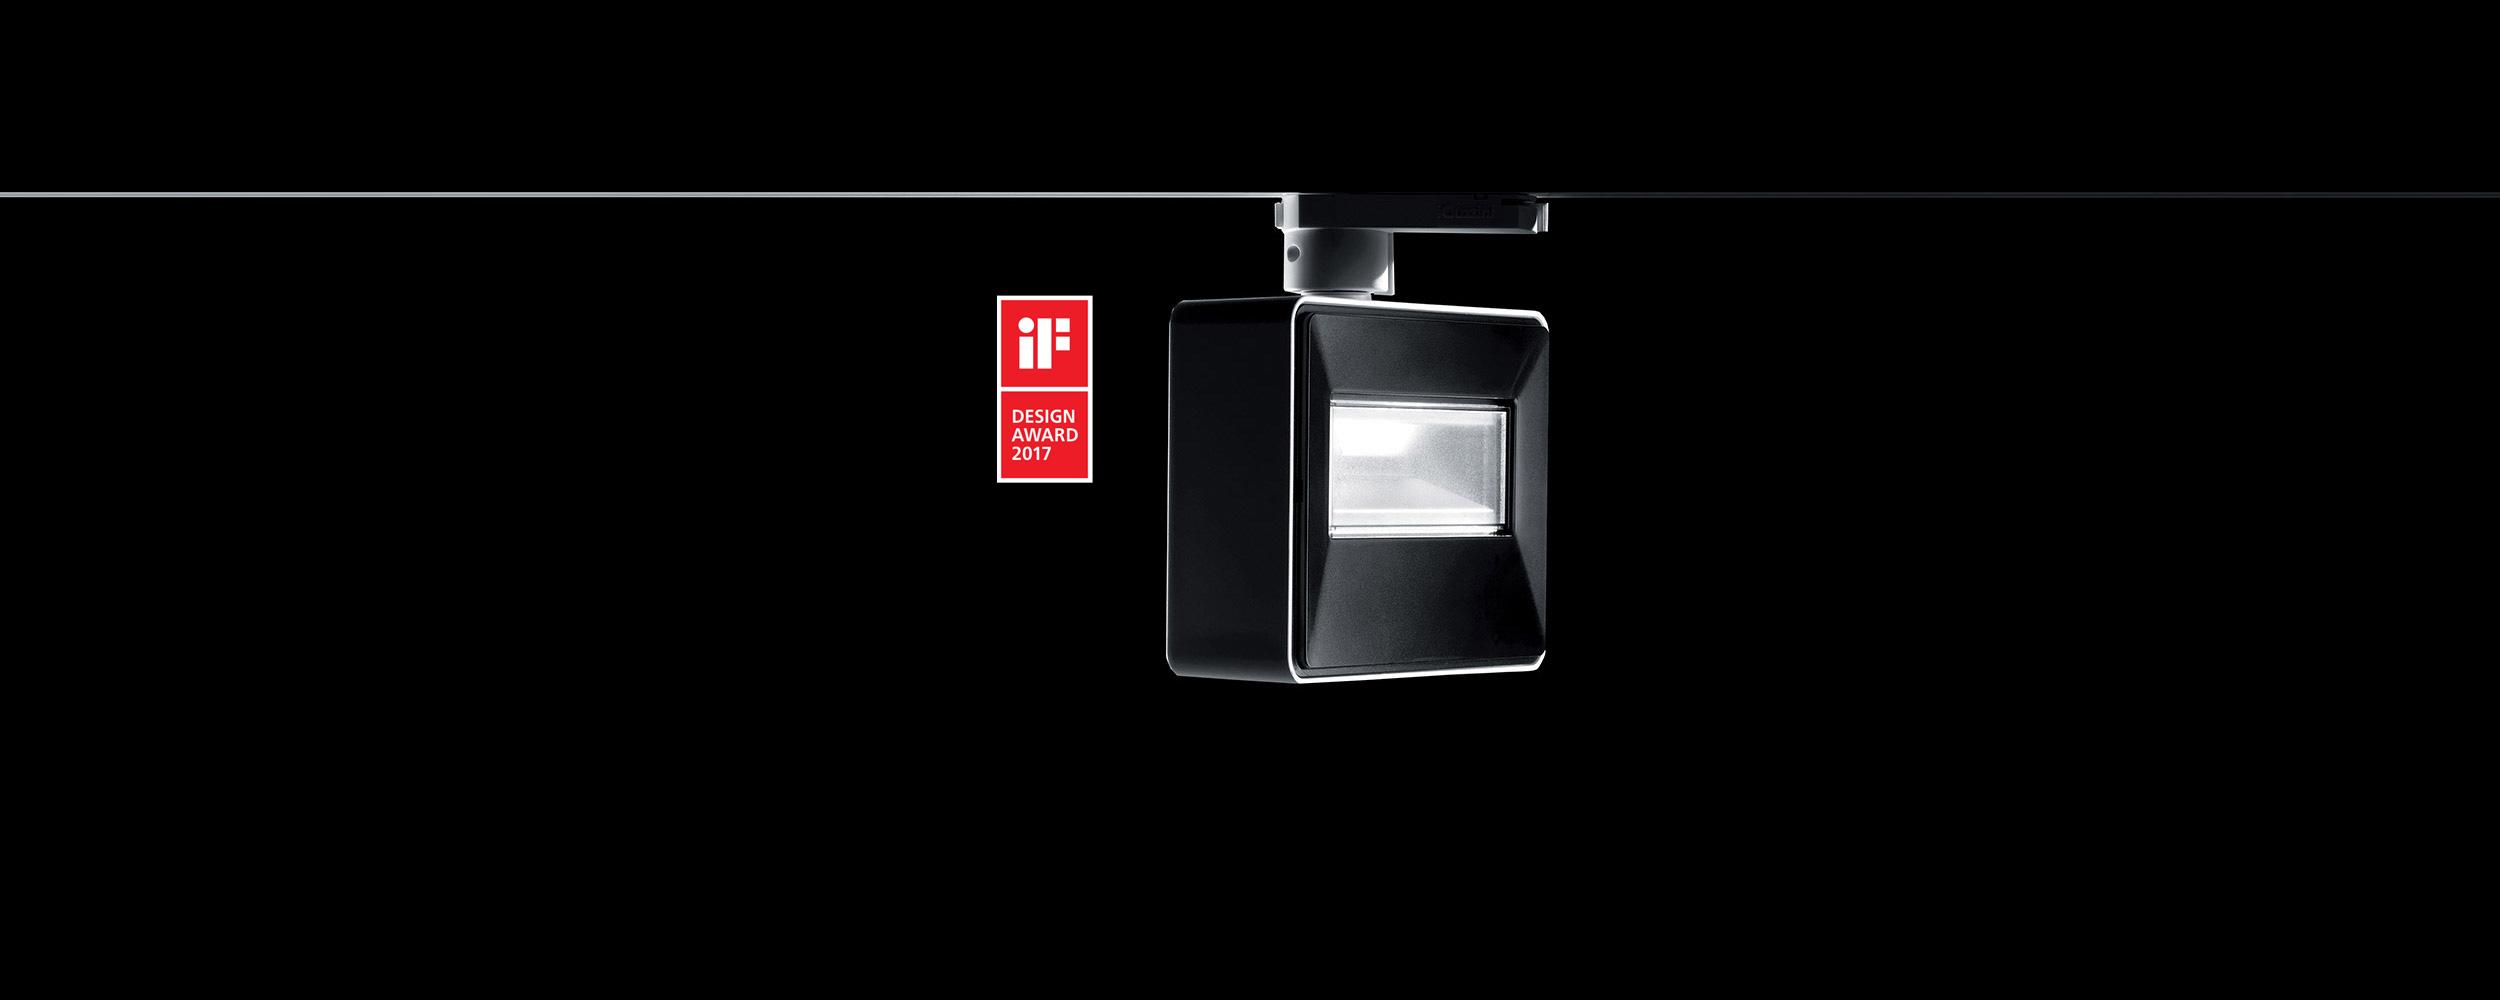 View wins iF Design Award 2017